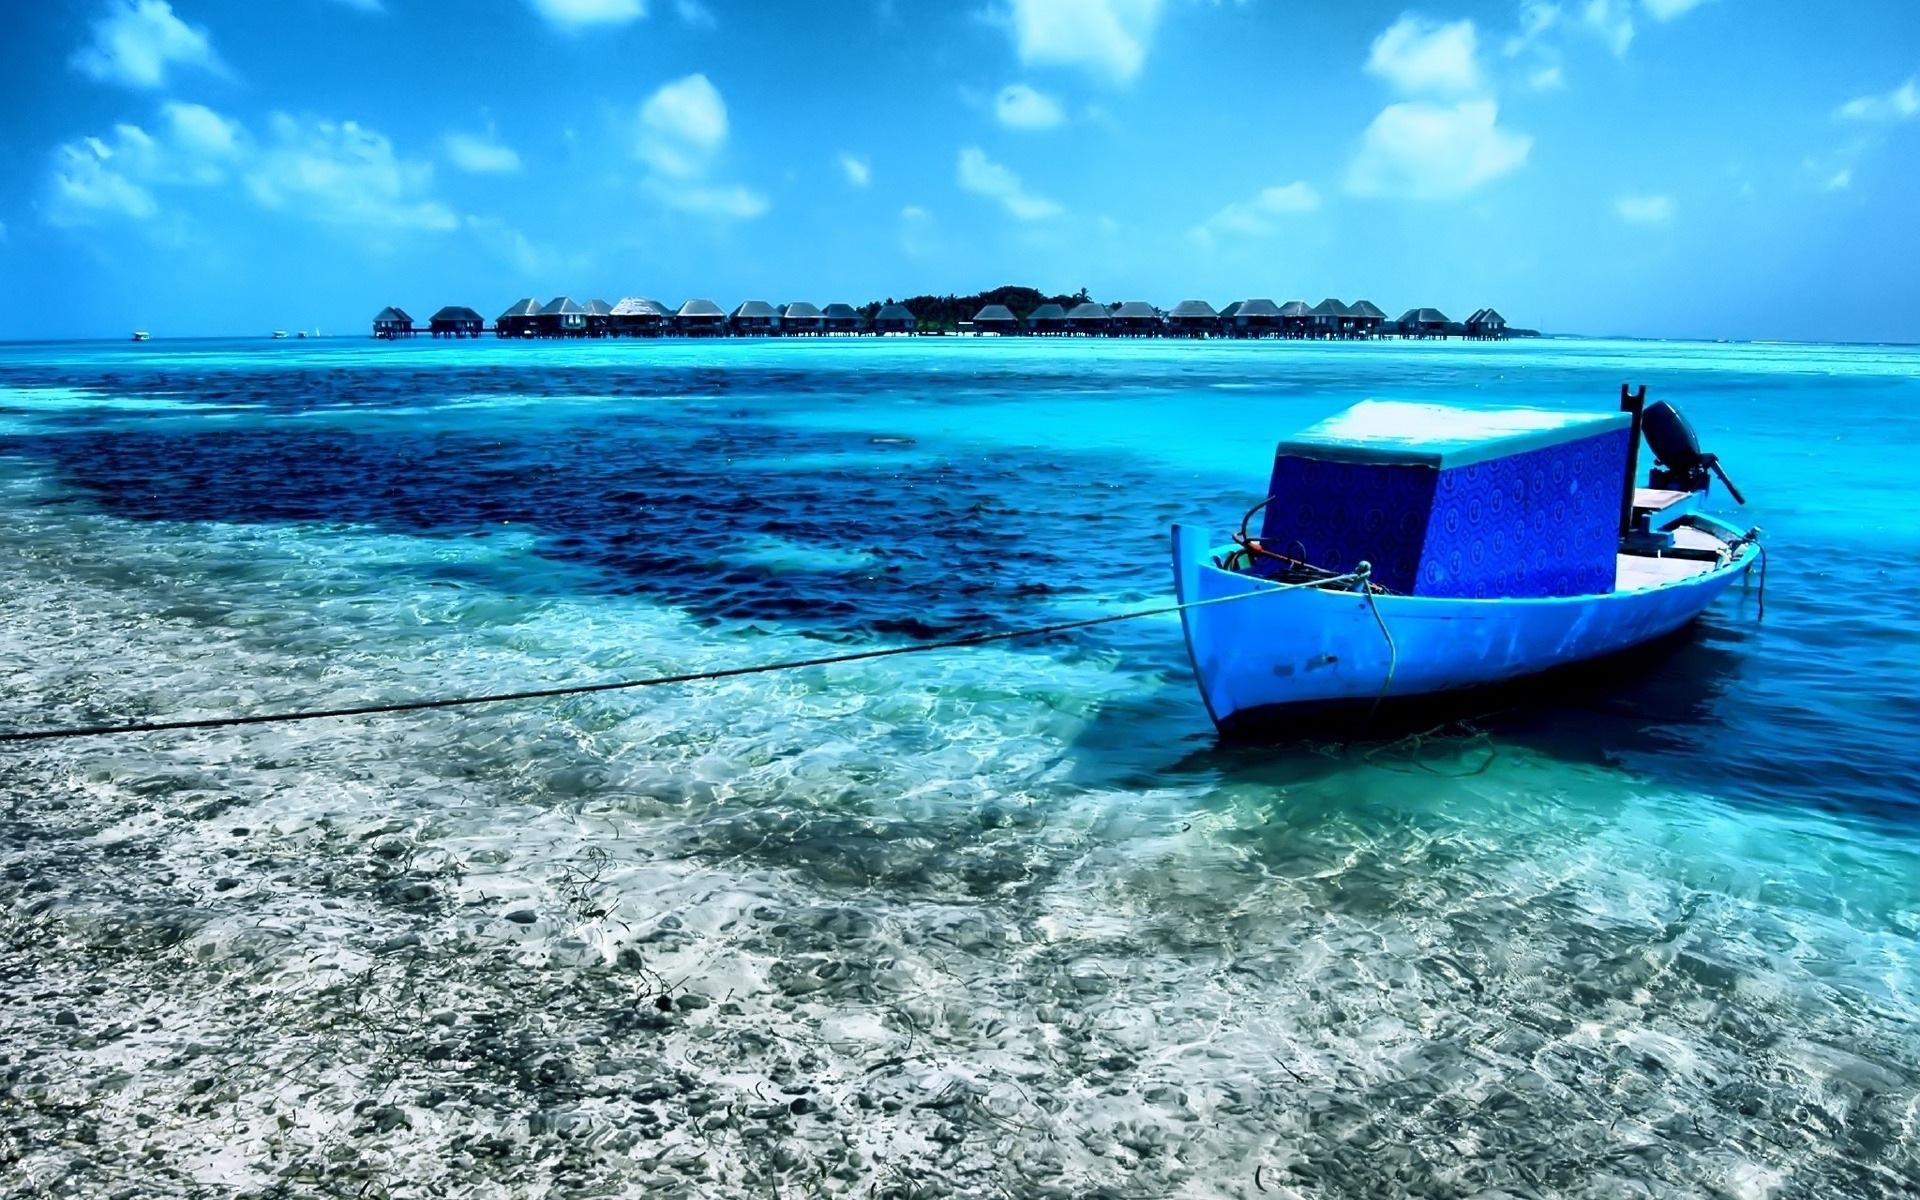 Картинки Лодка, залив, берег, голубая вода, веревка фото и обои на рабочий стол